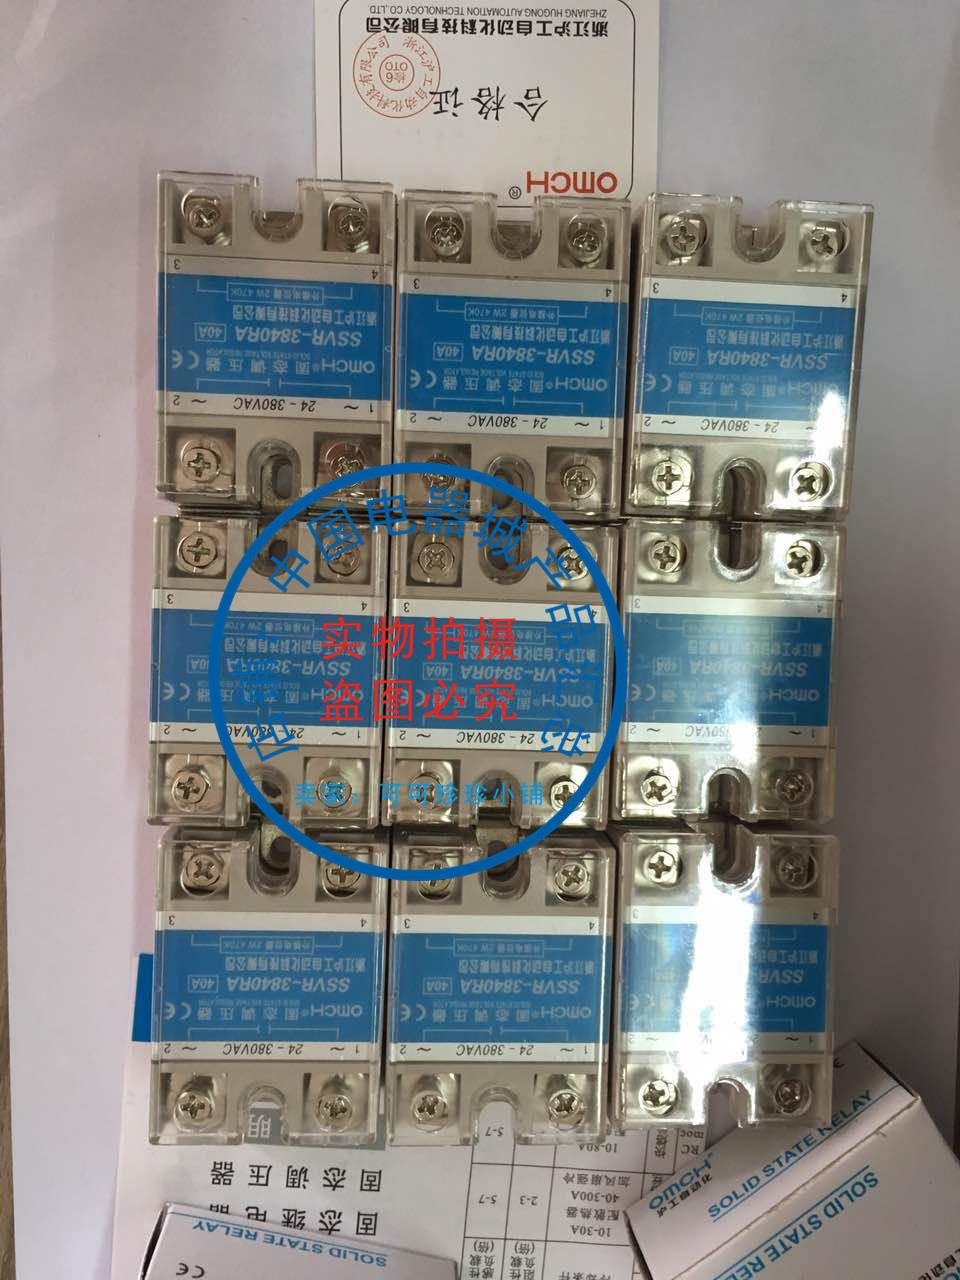 SSVR-3840RA faststof spændingsregulator 24-380VAC ekstern potentiometer 2W470K